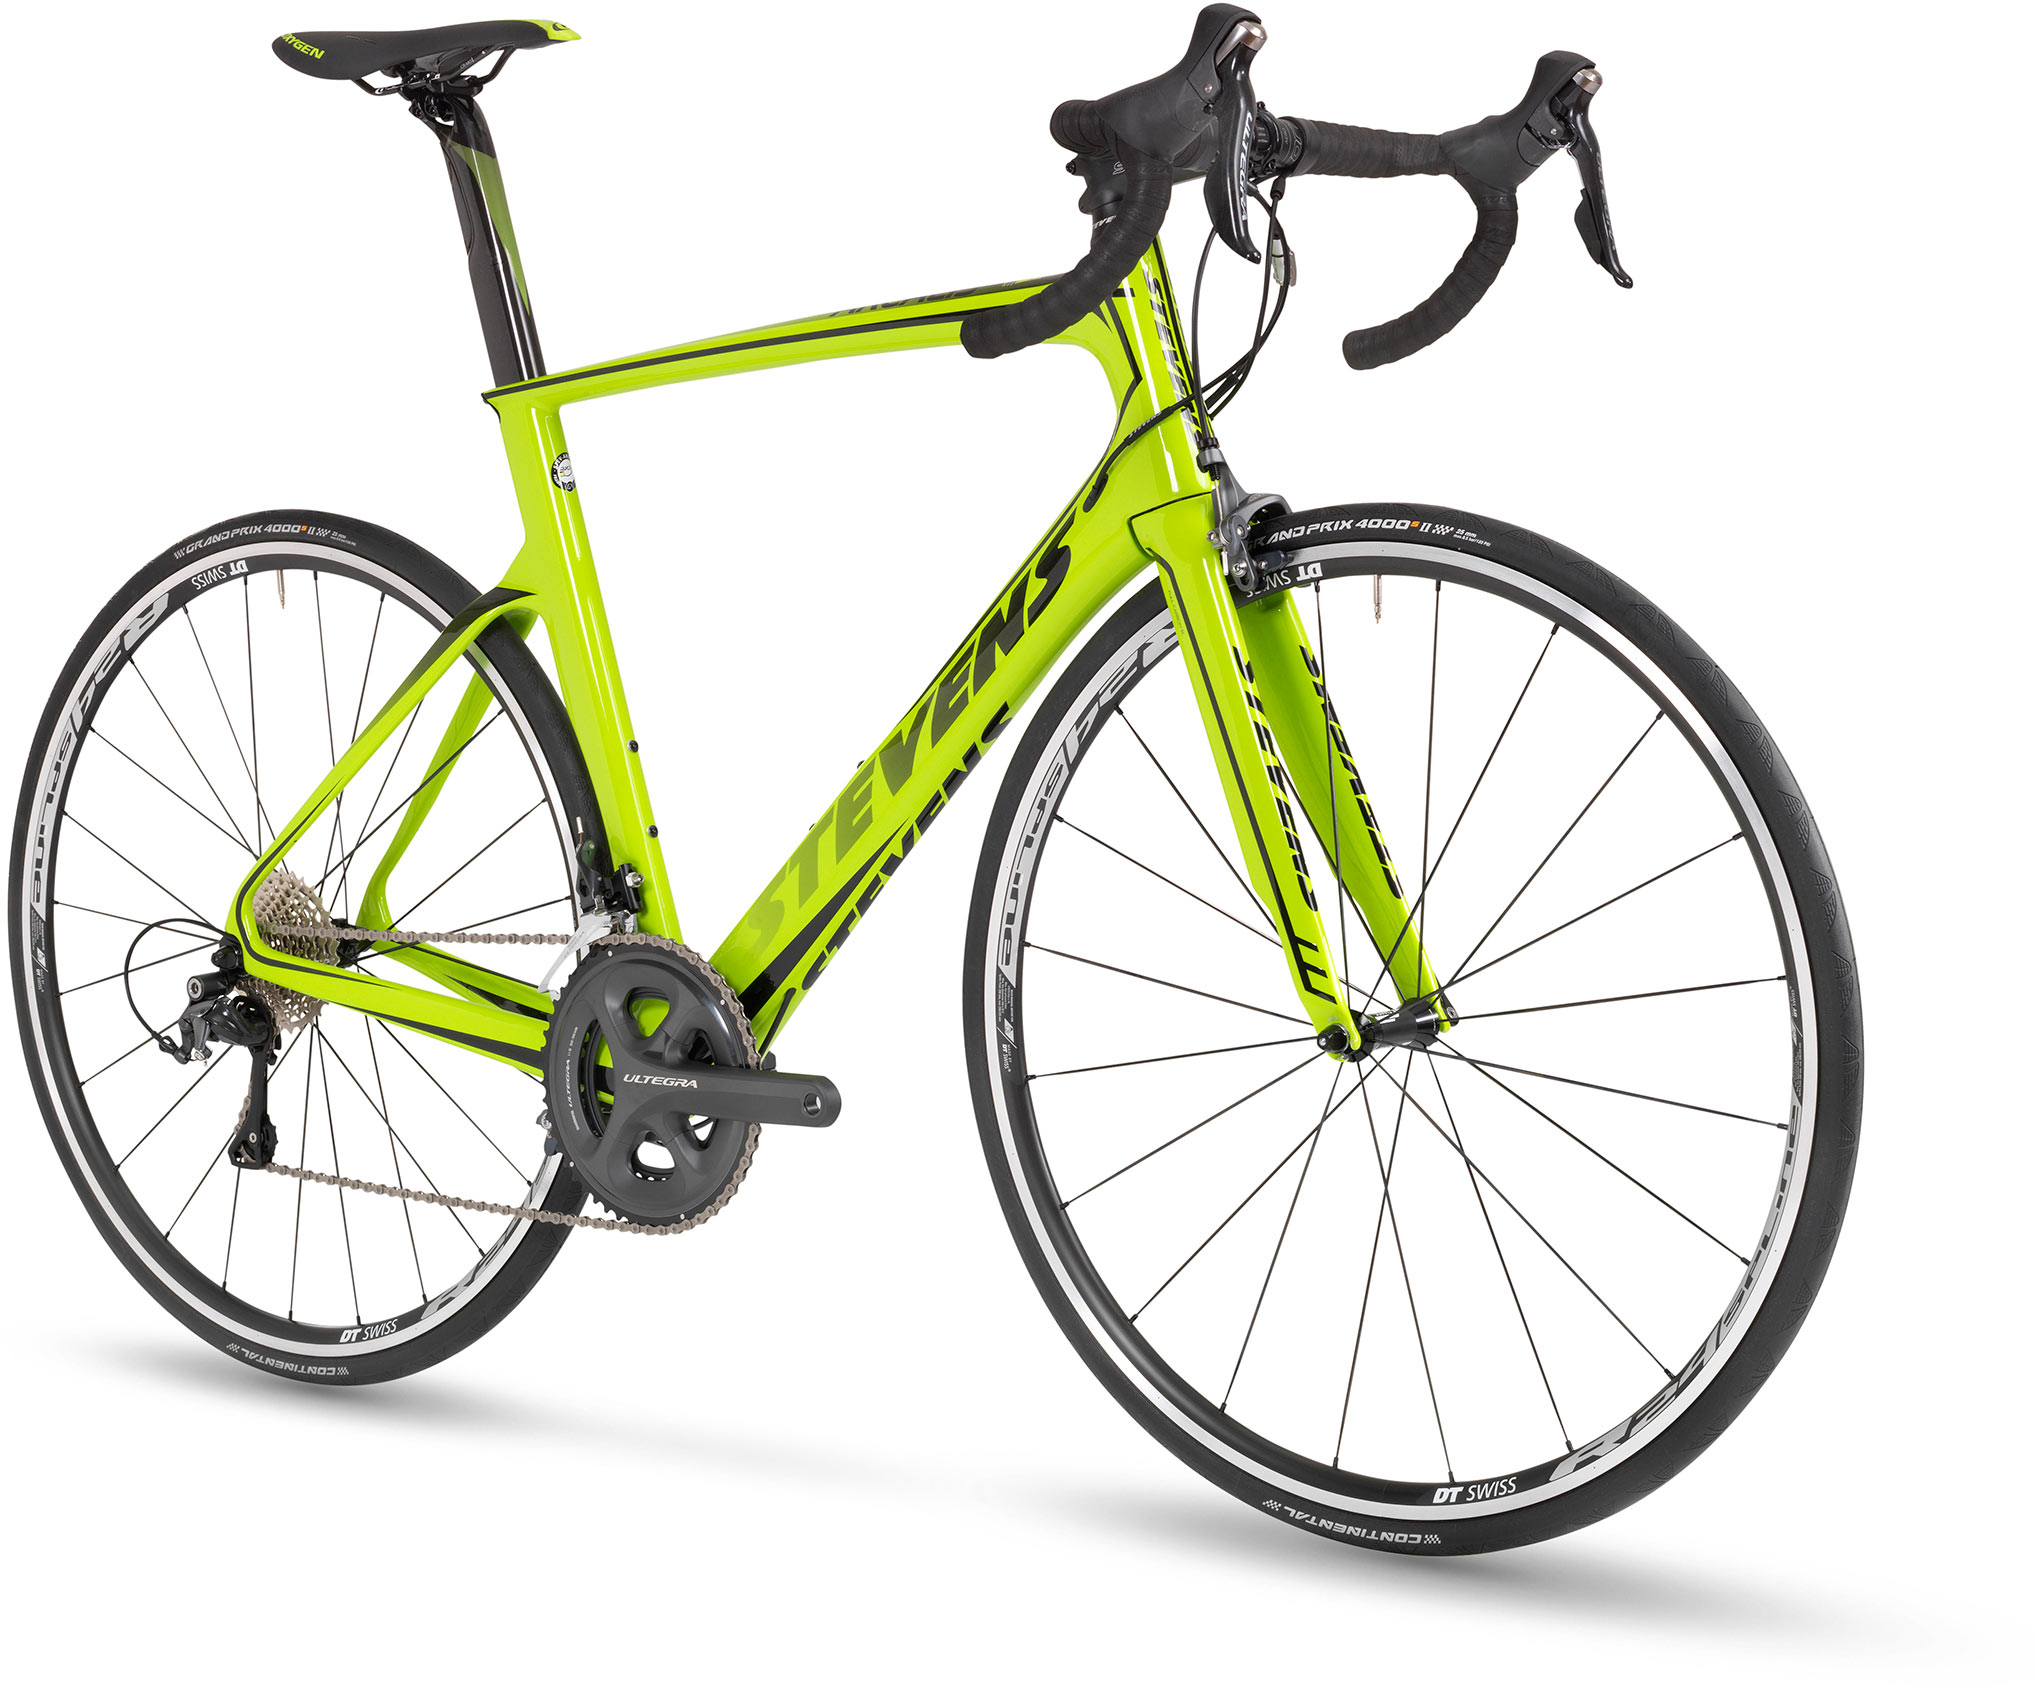 Arcalis - Stevens Bikes 2016